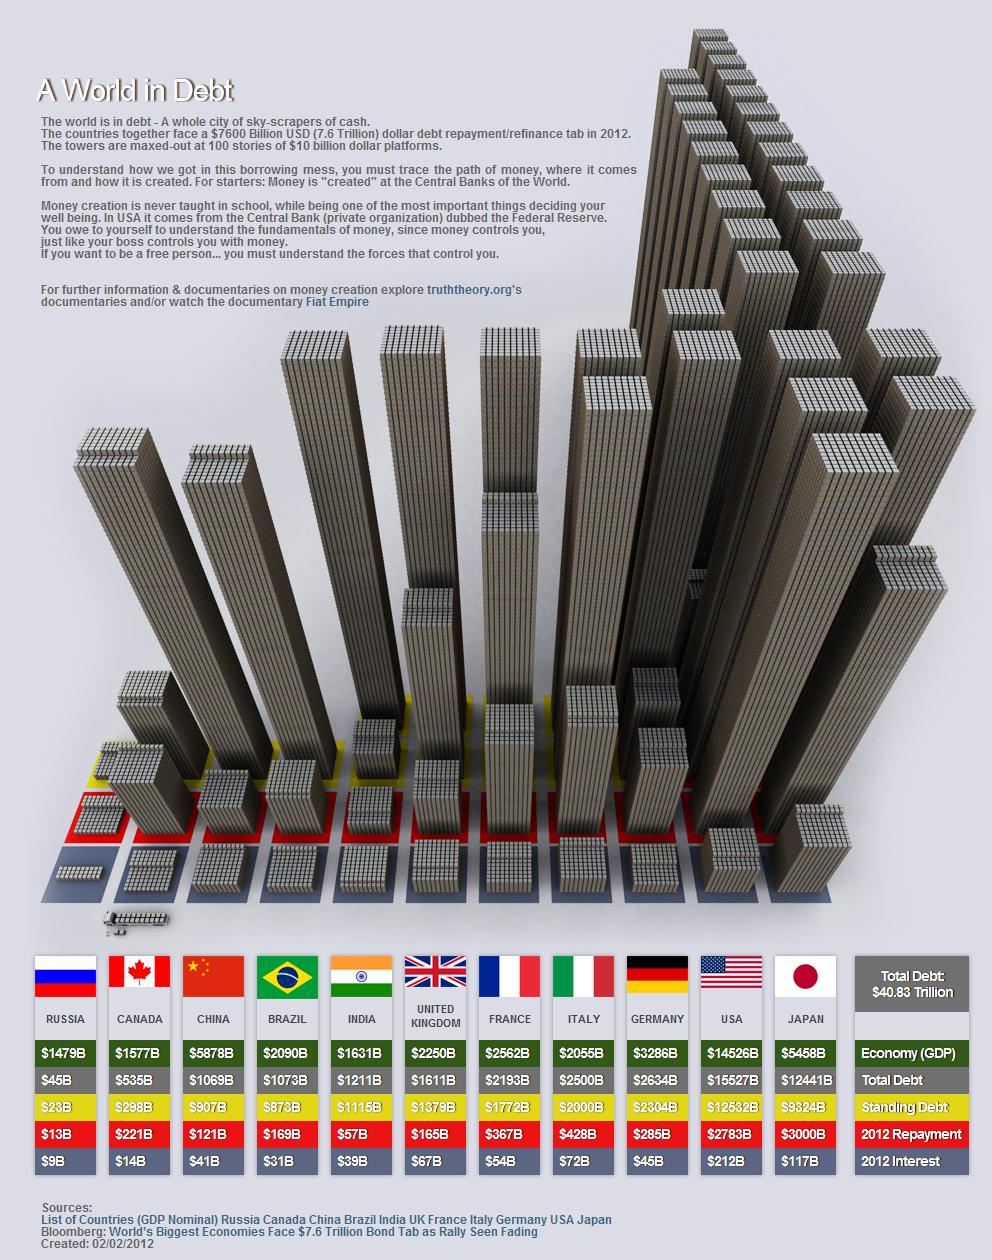 2012.debt.USA.ouch.jpg